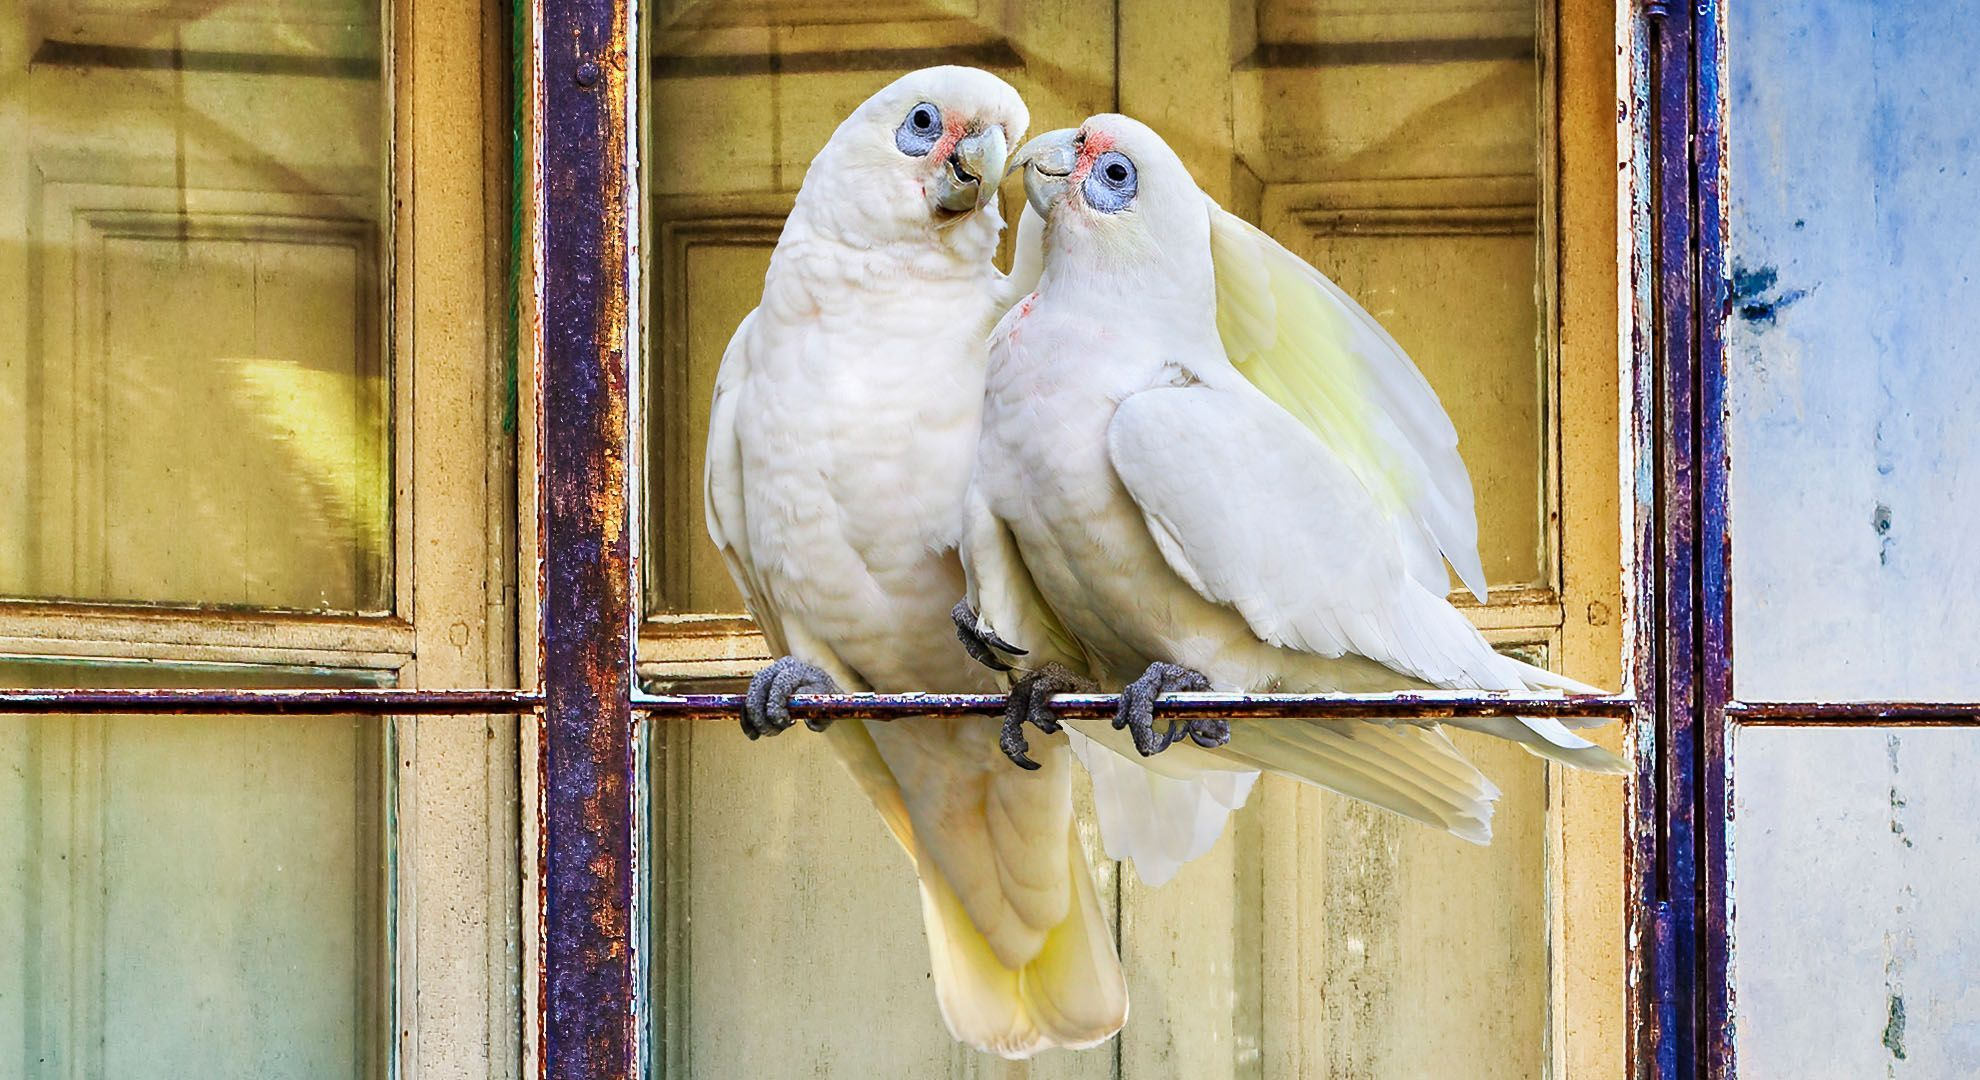 Balcón Plumicromado / A colouful balcony of feathers